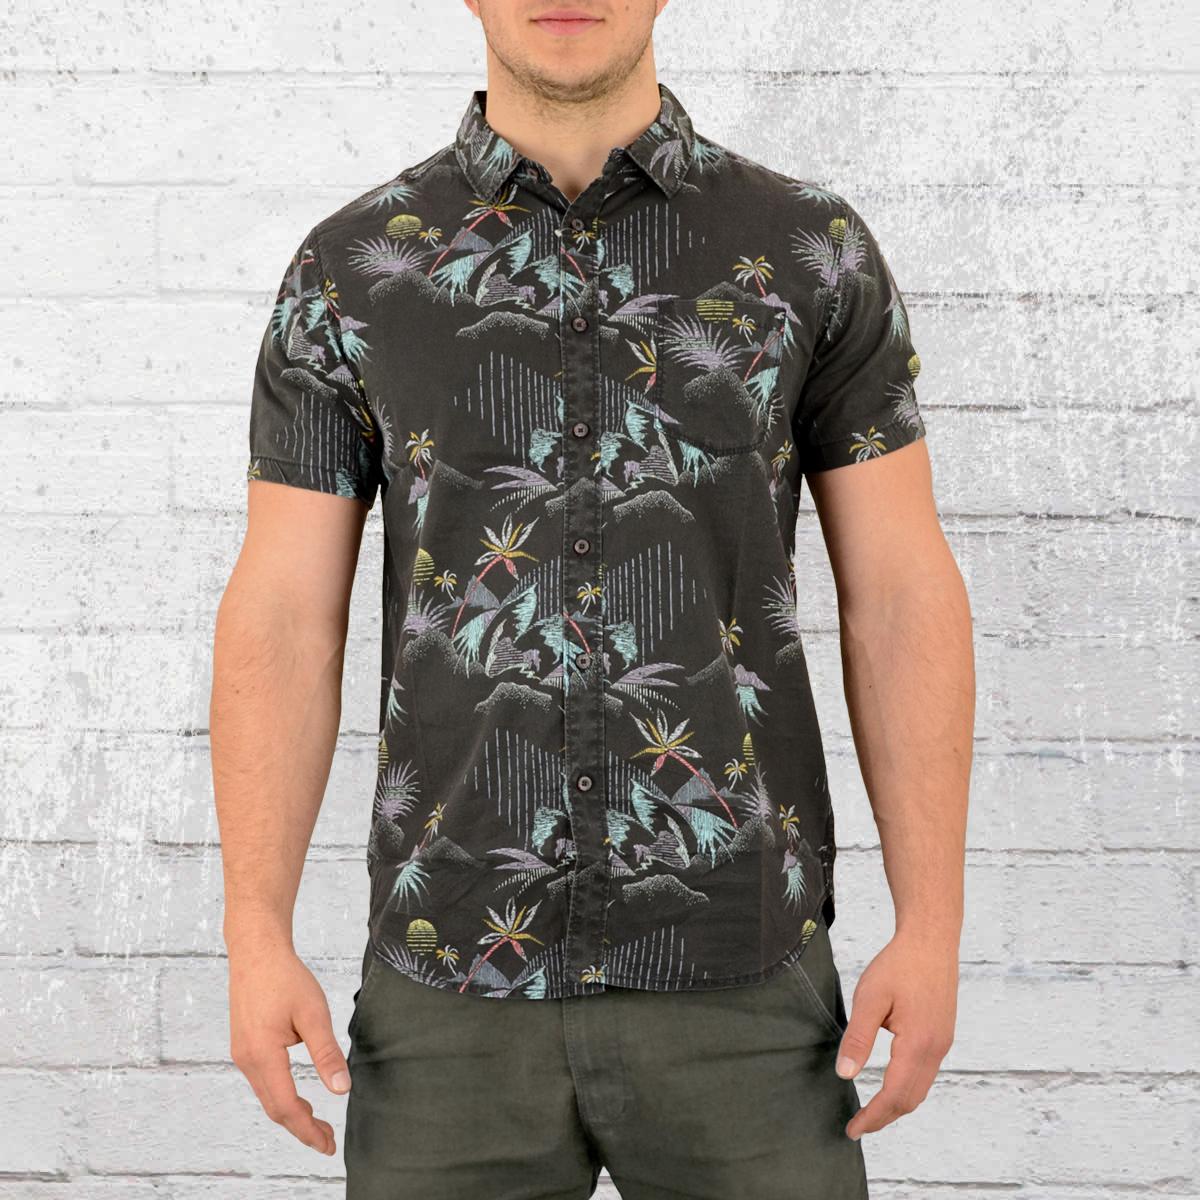 d1c7db533a7eb Billabong Mens Hawaii Shirt Sundays Floral black. ›‹